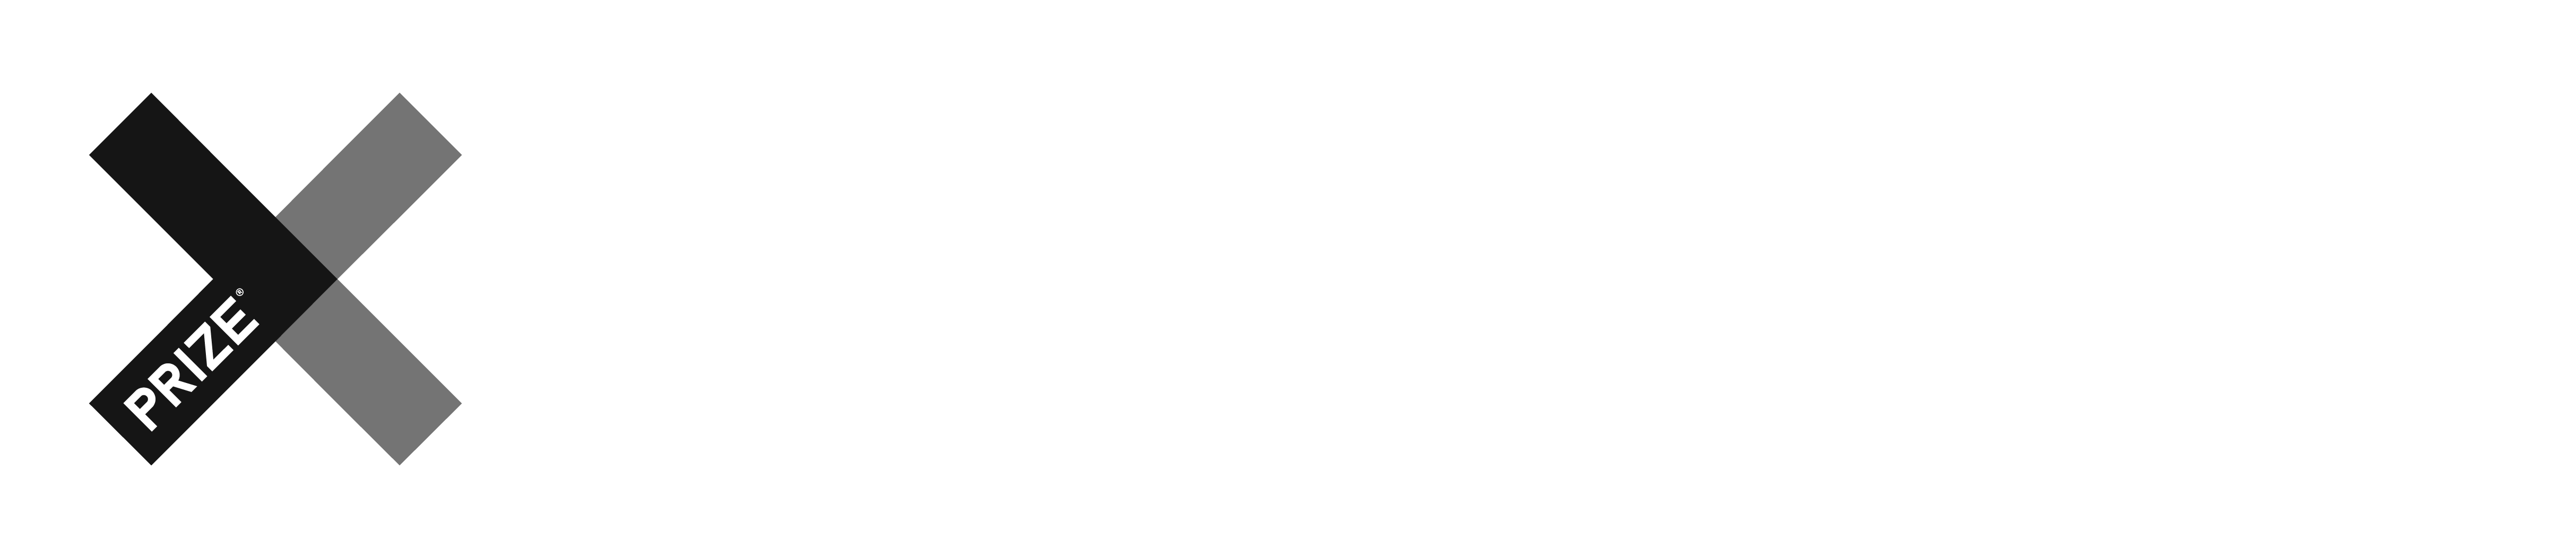 XPRIZE Abundant Energy Alliance